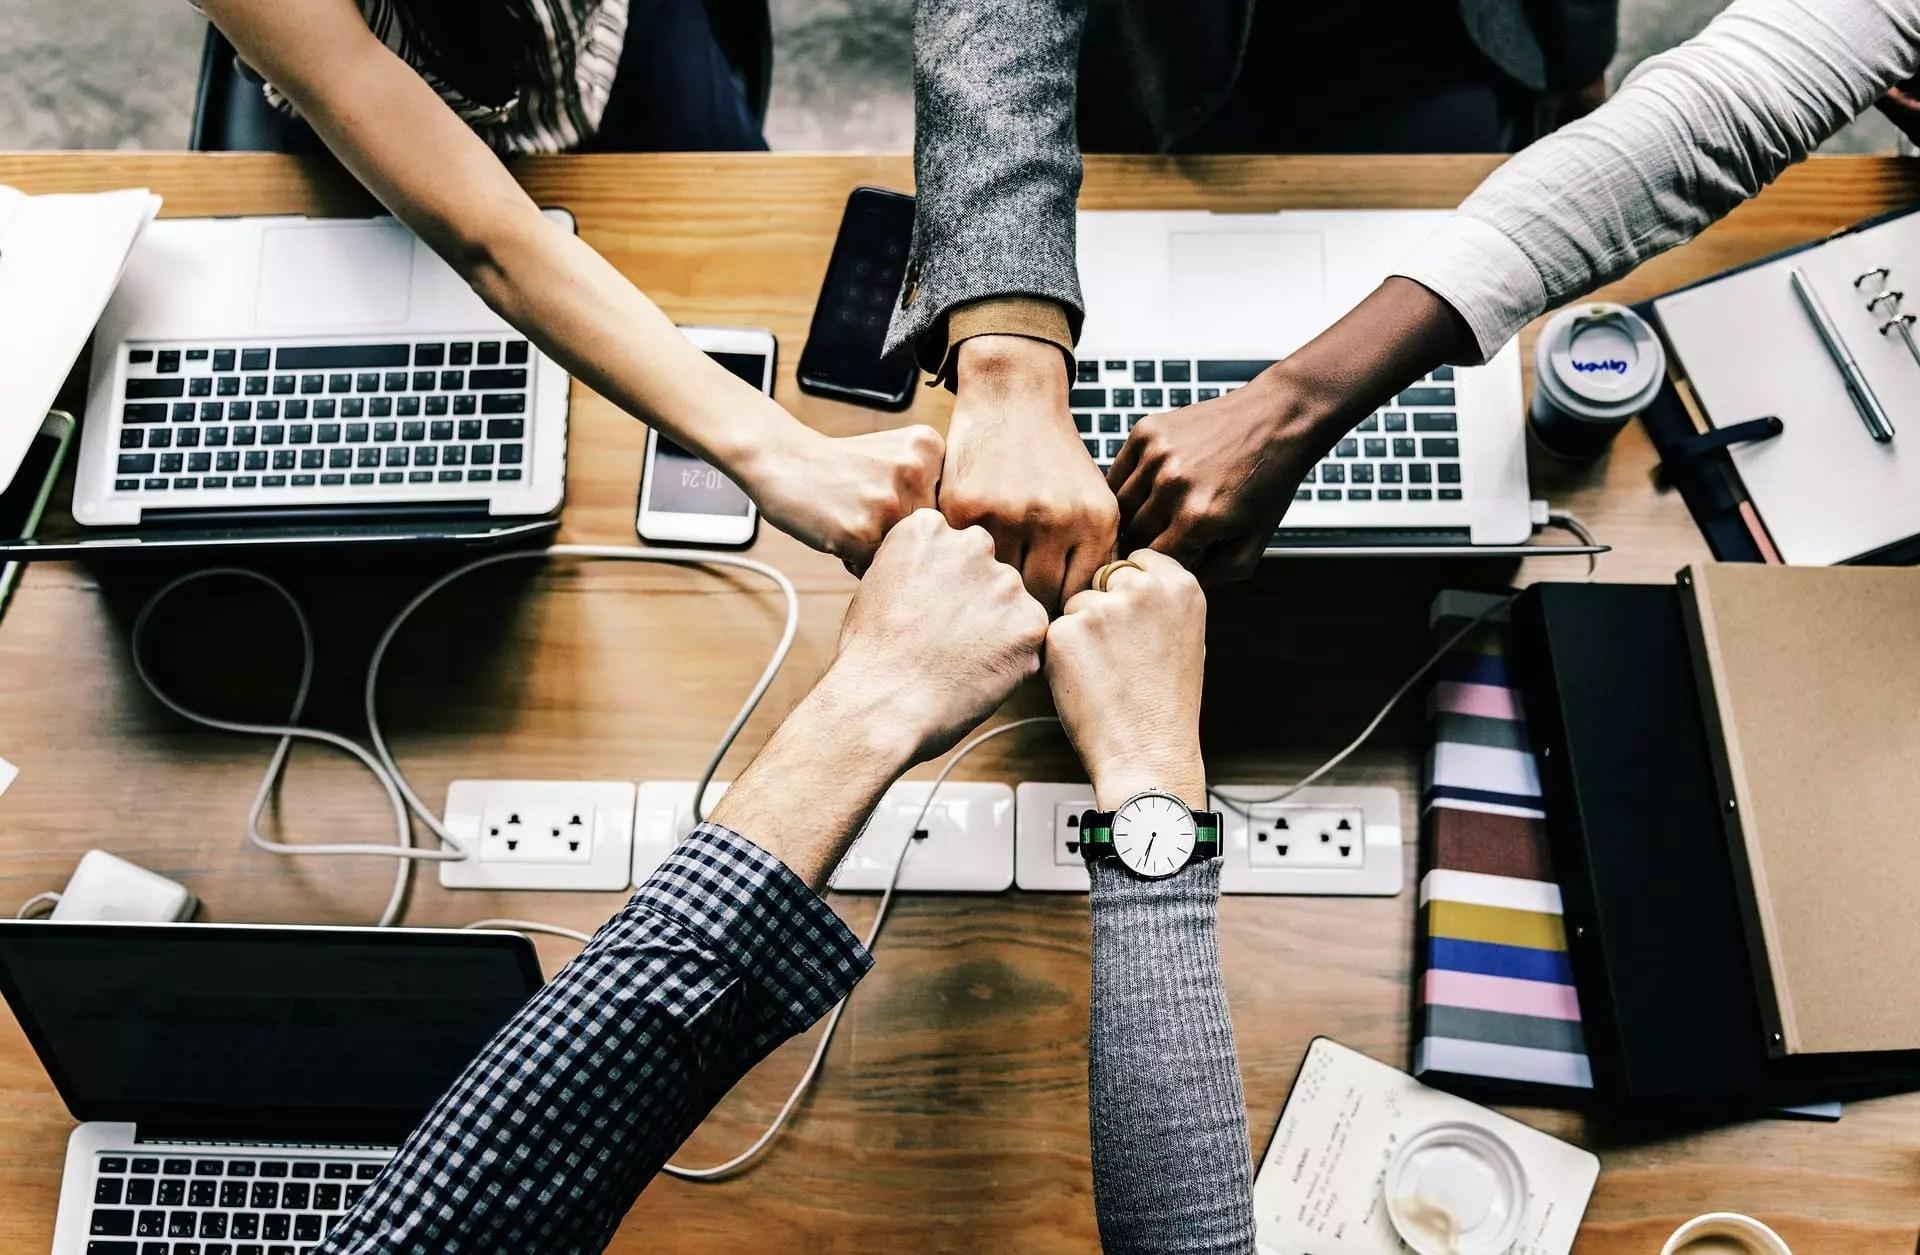 eNitiate-Millennials-Workspace-2018